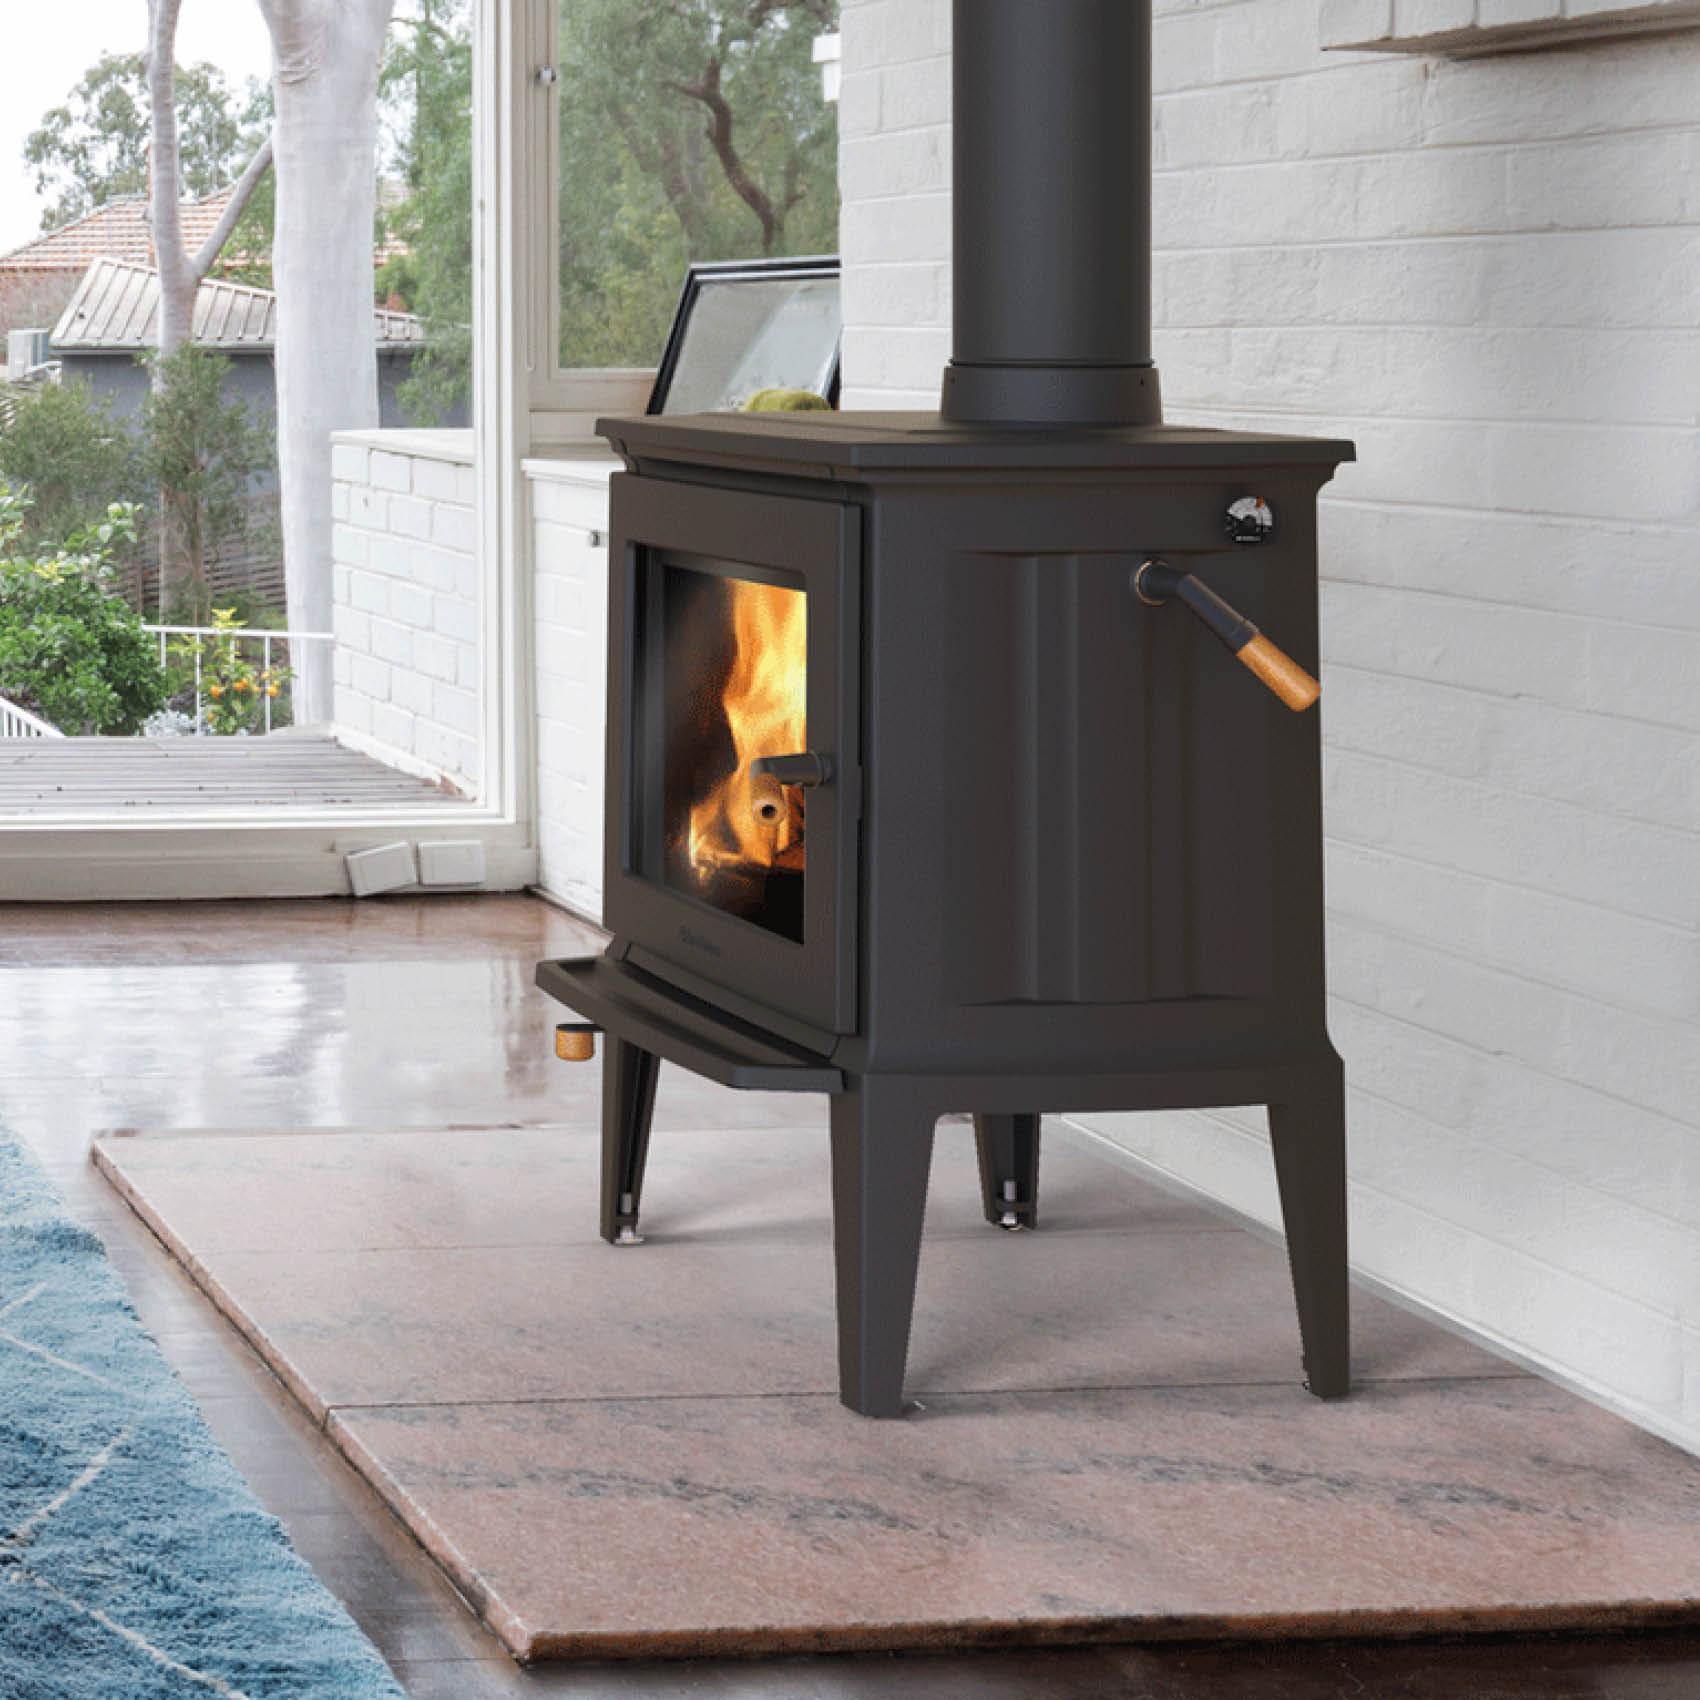 Wood Burning Freestanding Stove